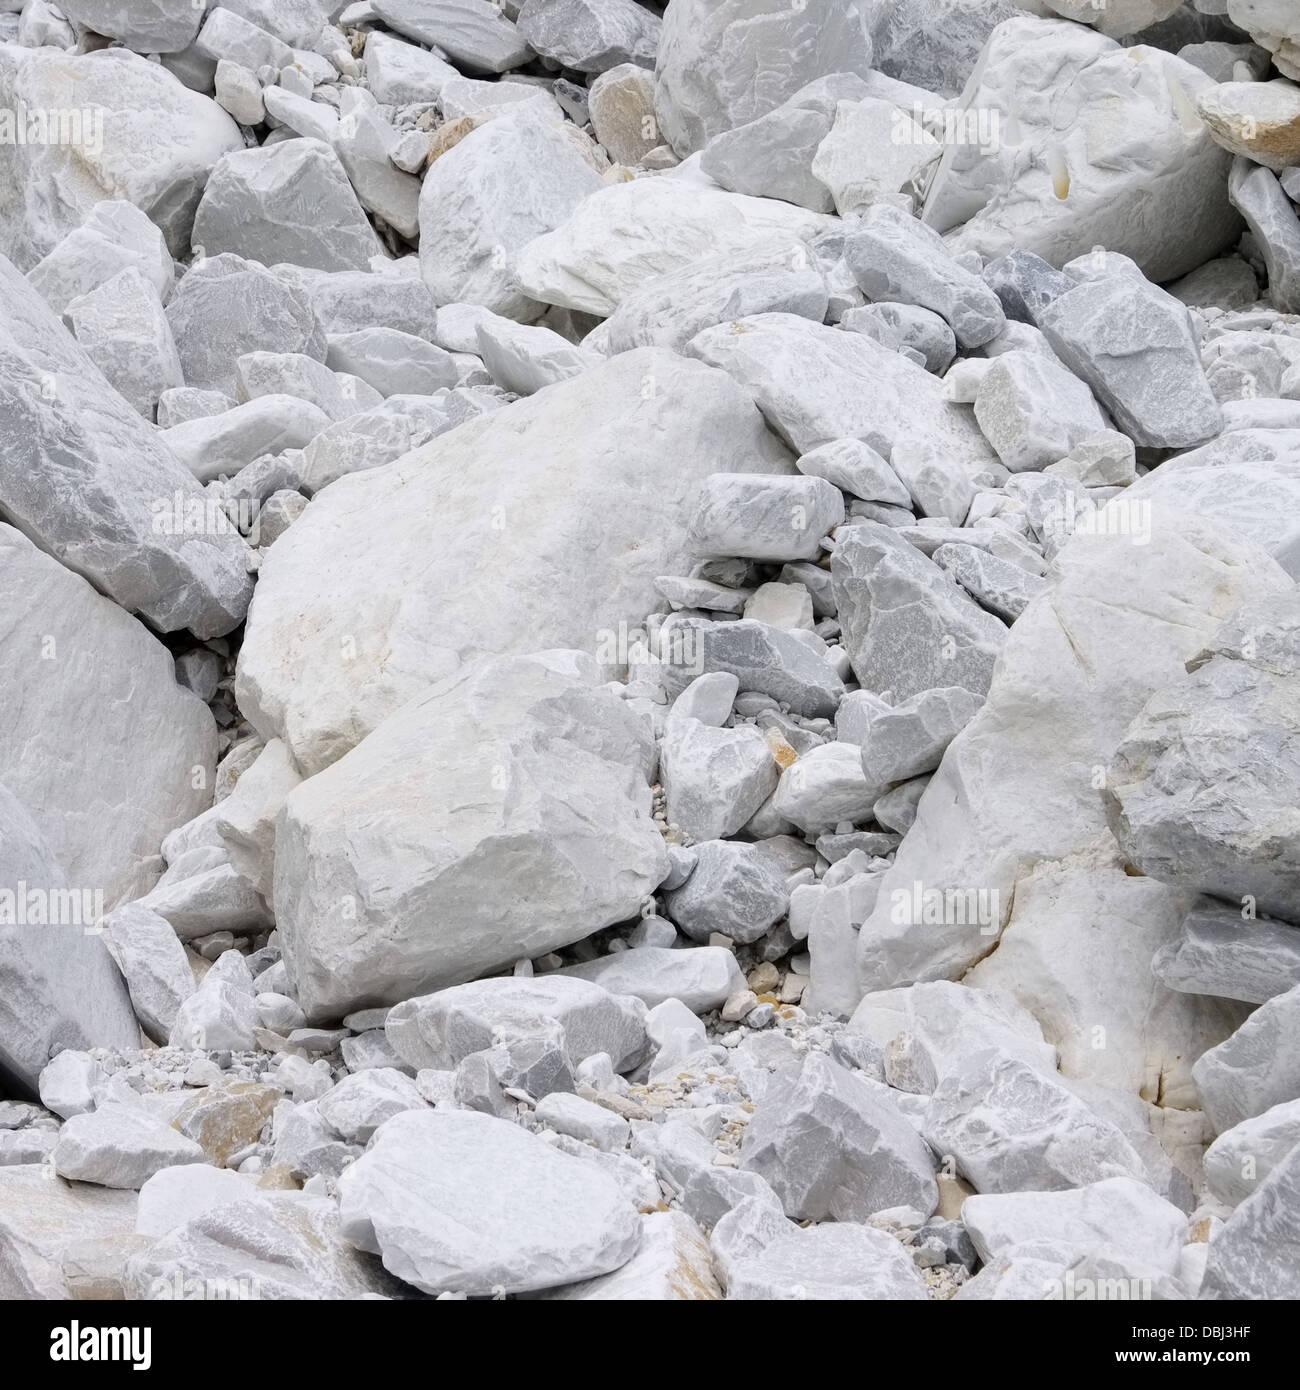 Carrara Marmor carrara marmor steinbruch carrara marble pit 29 stock photo